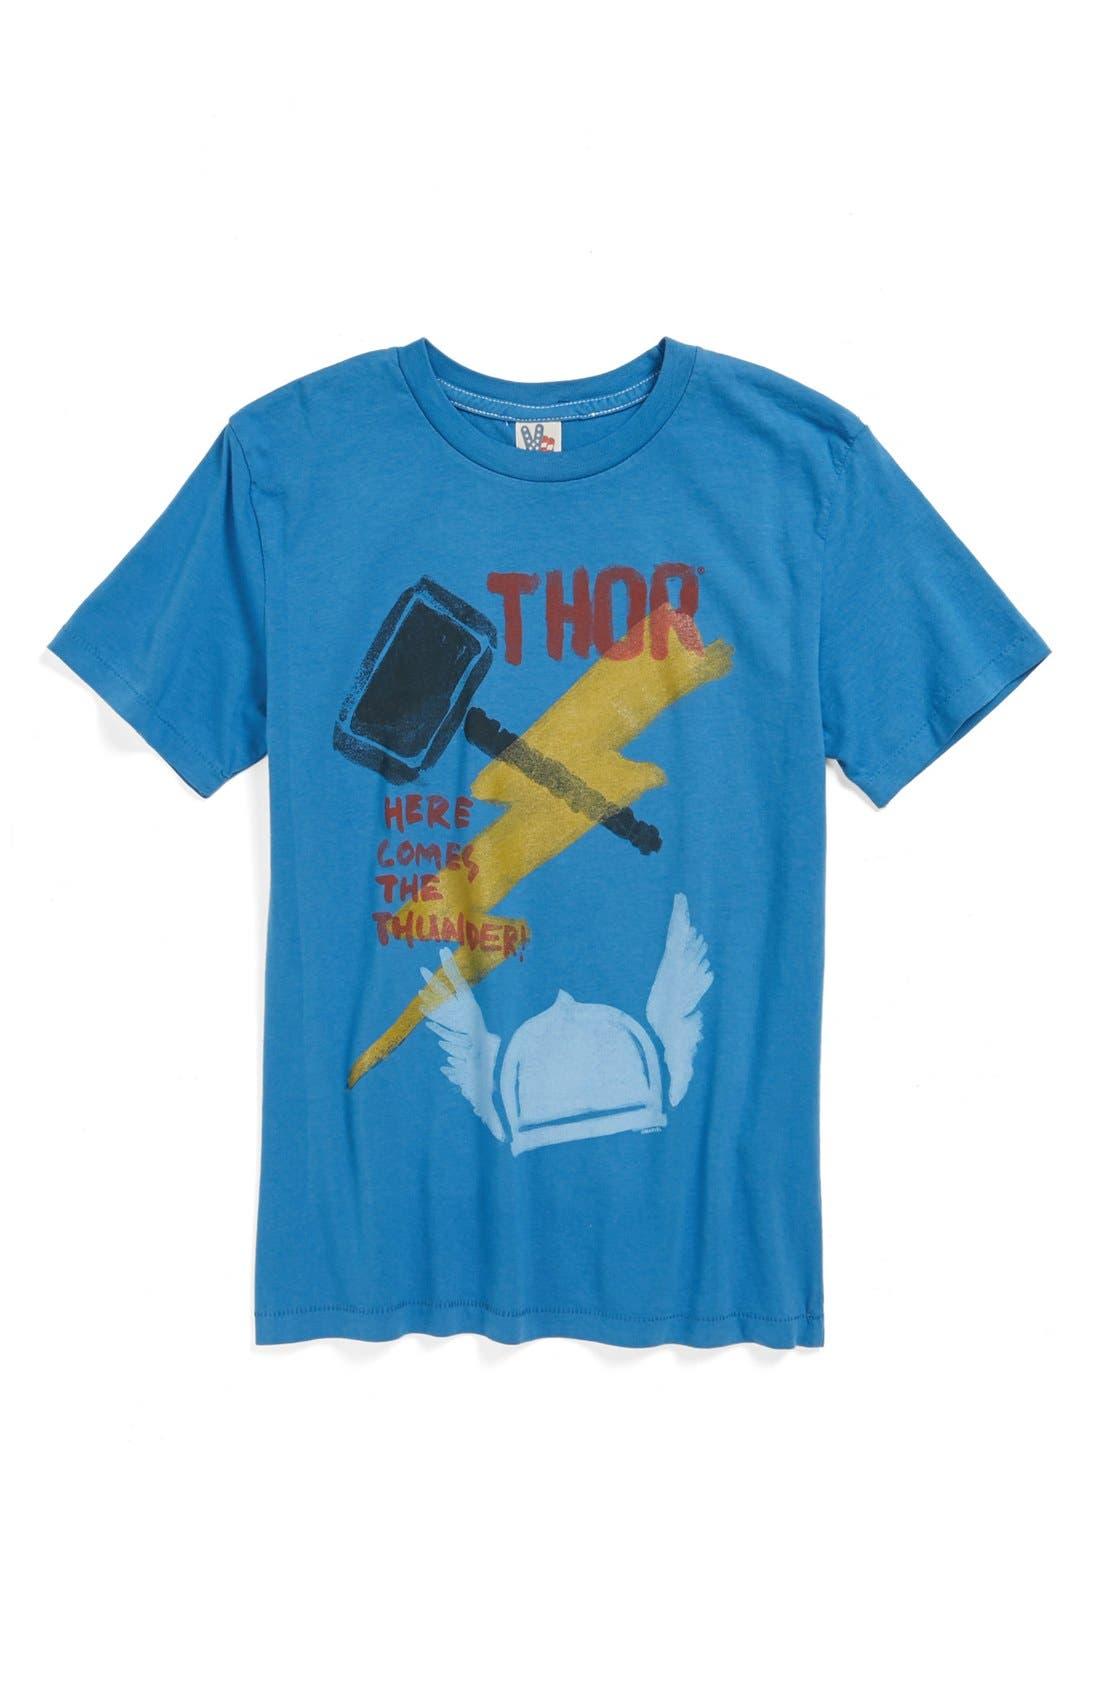 Main Image - Junk Food 'Thor' T-Shirt (Little Boys & Big Boys)